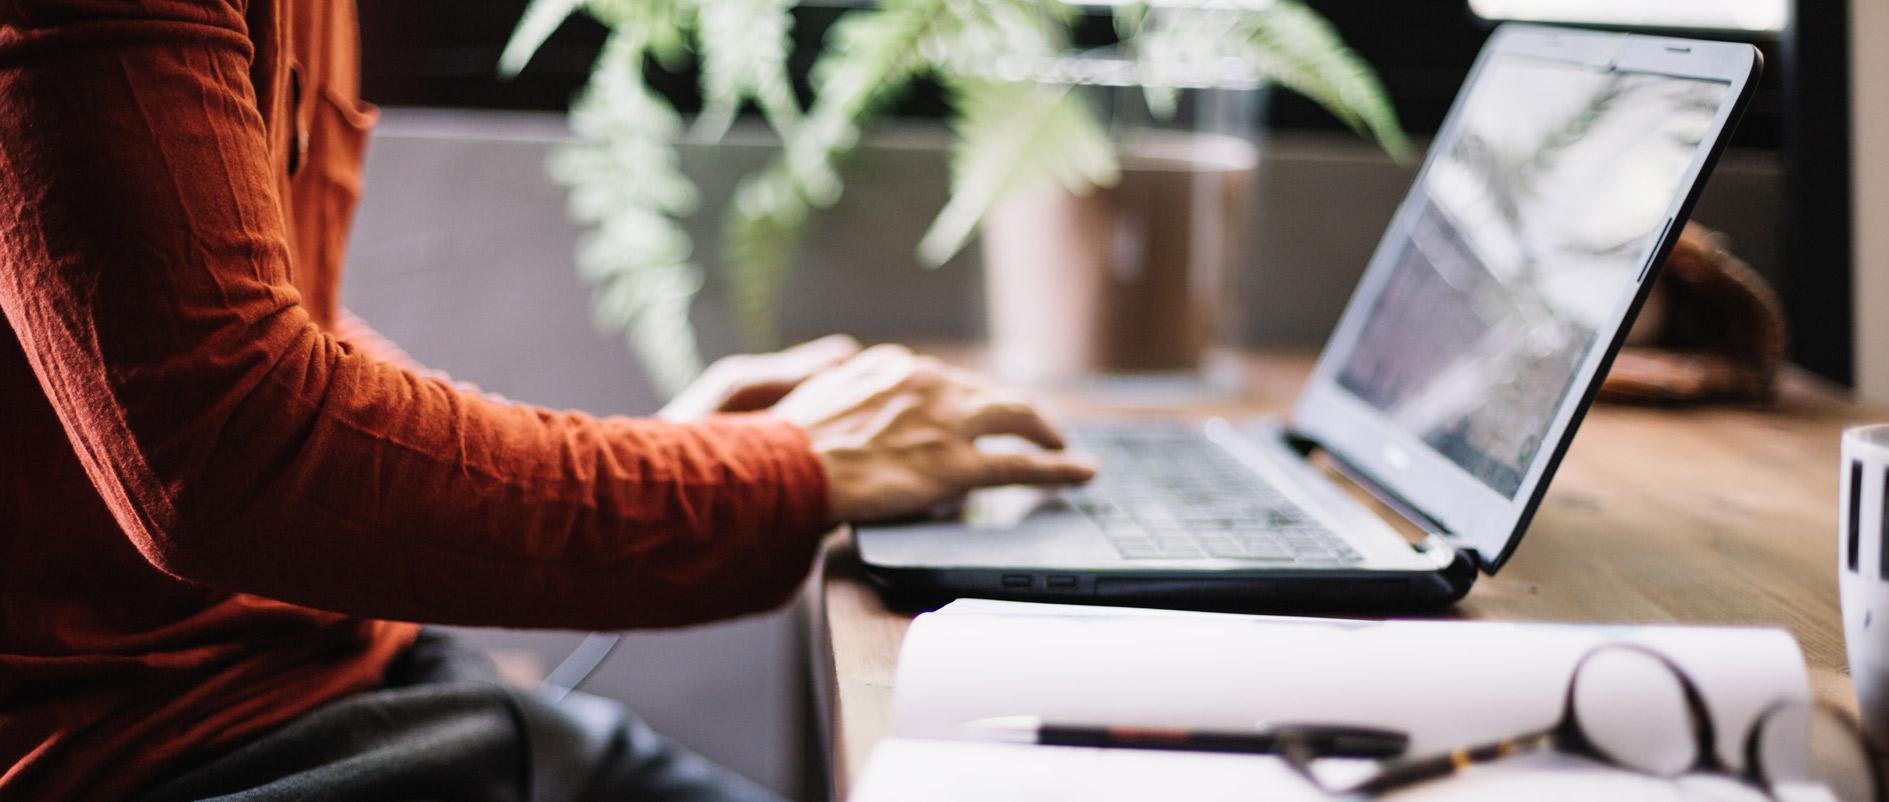 Blog writers needed